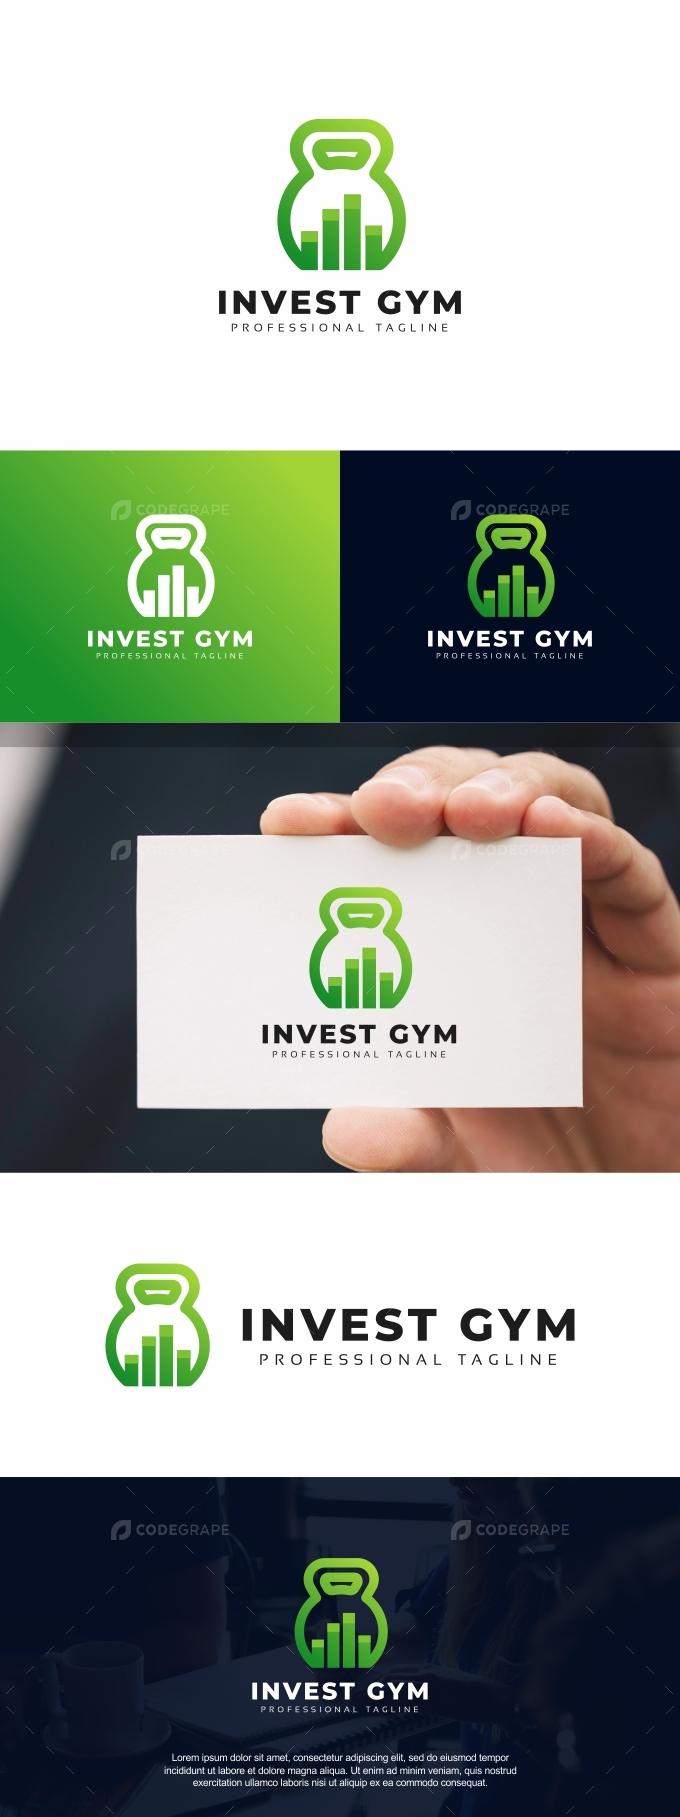 Invest Gym Logo